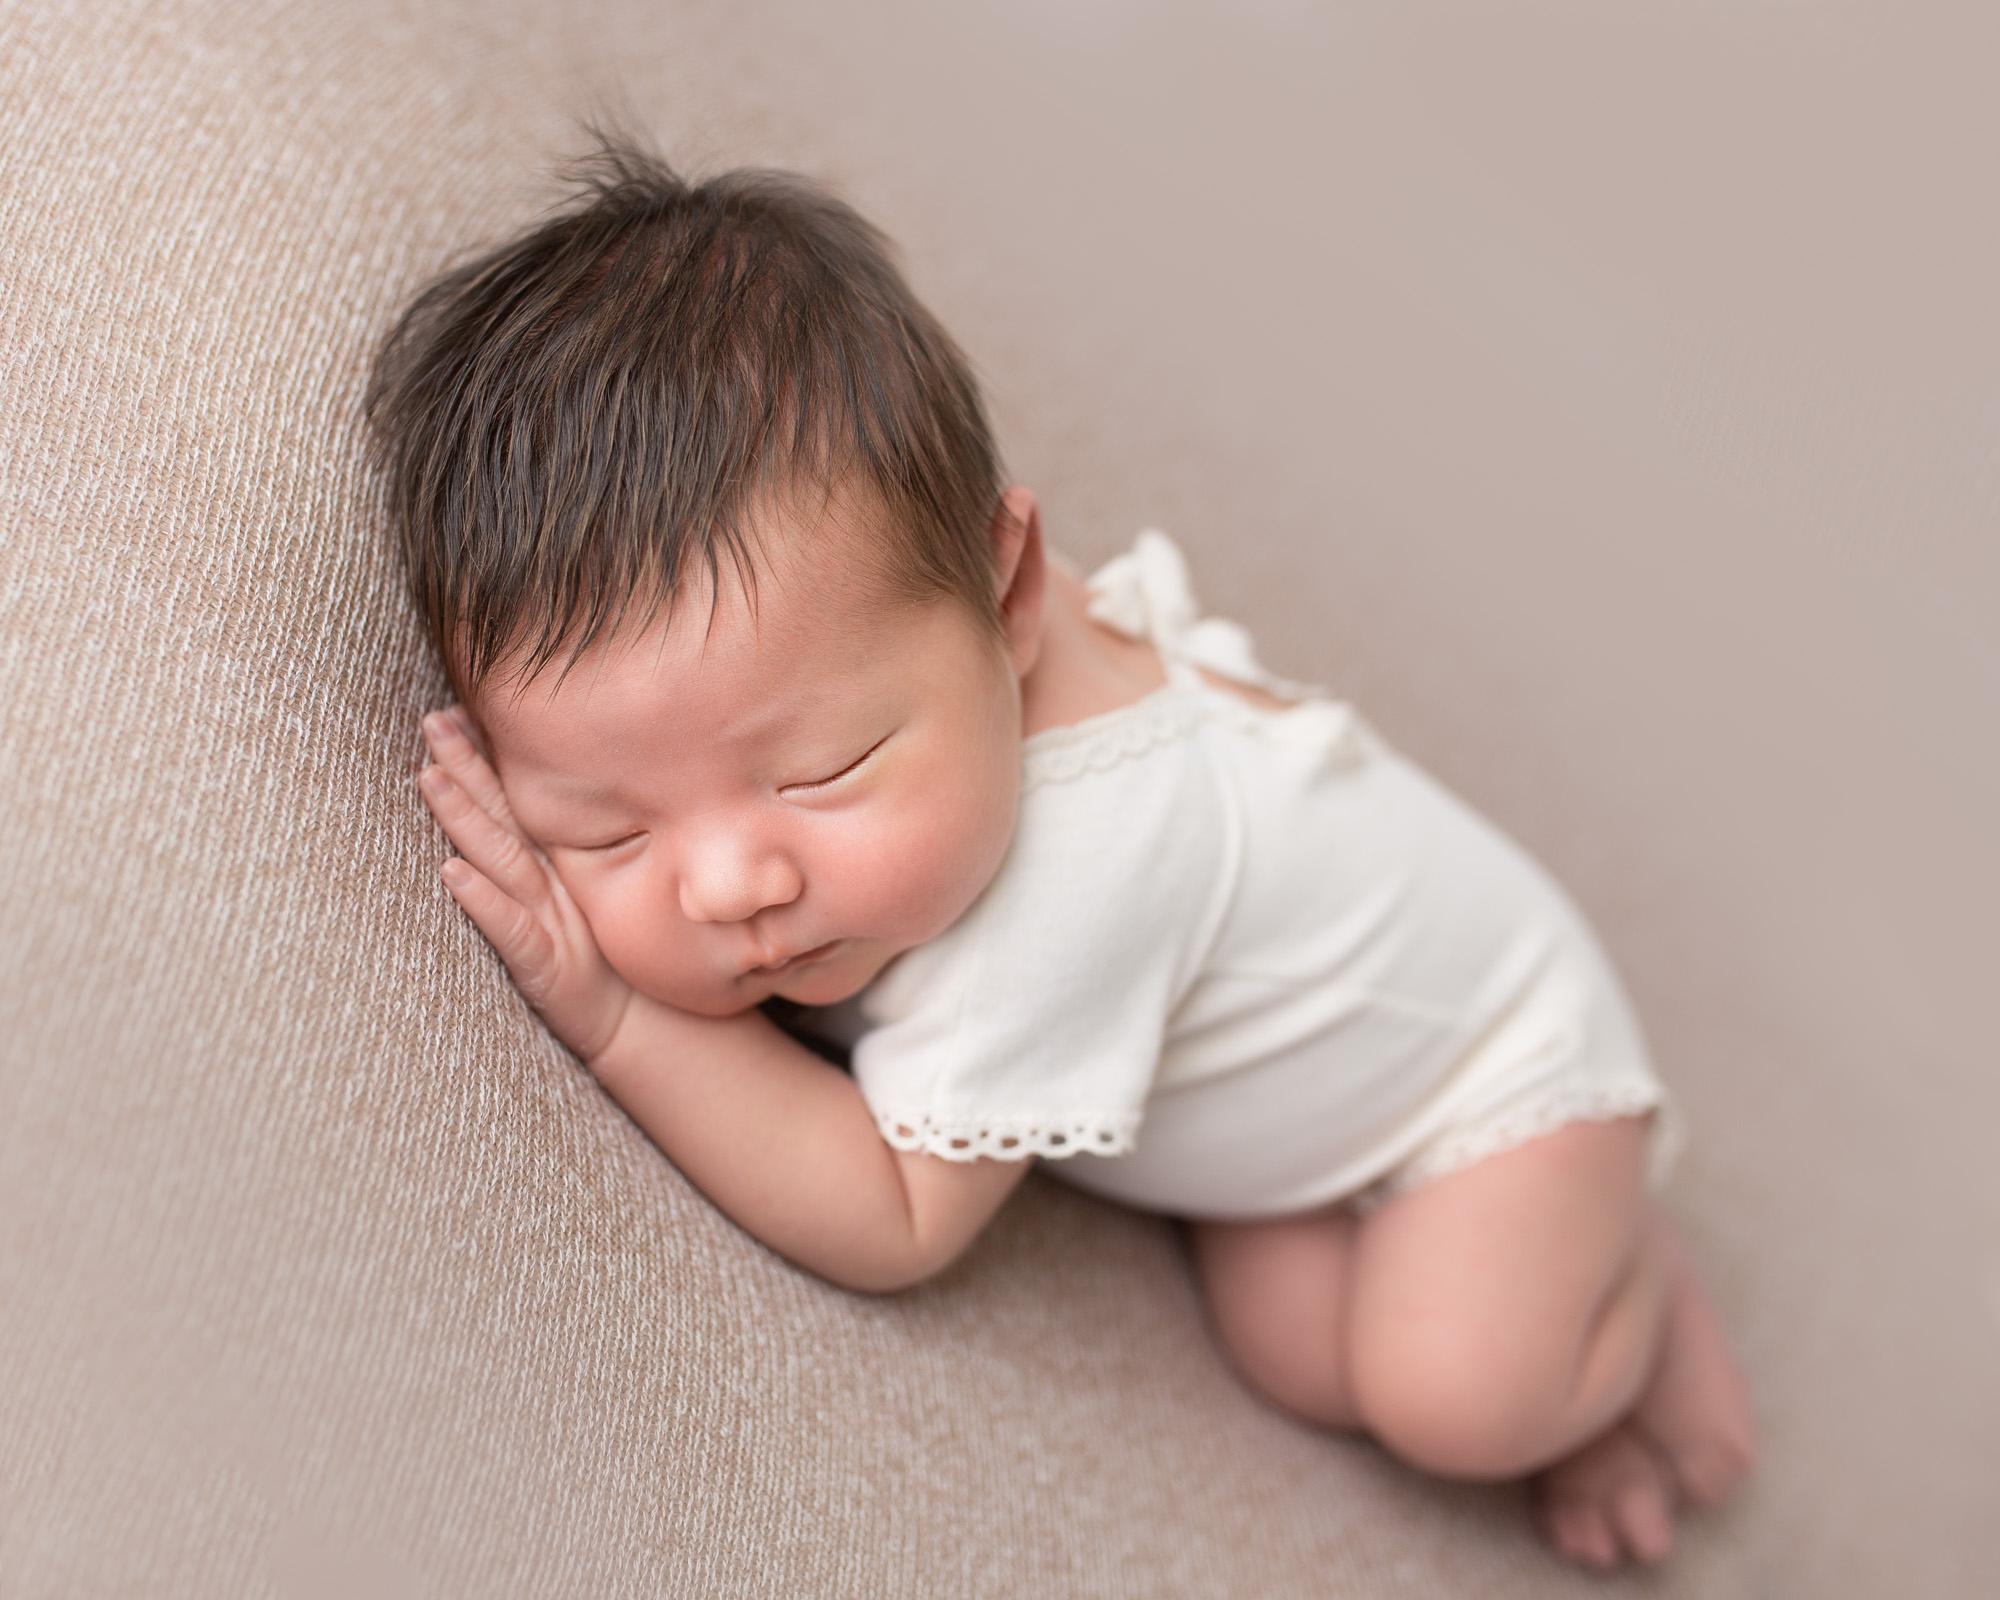 newborn-photographer-canton-woodstock-17-of-5.jpg